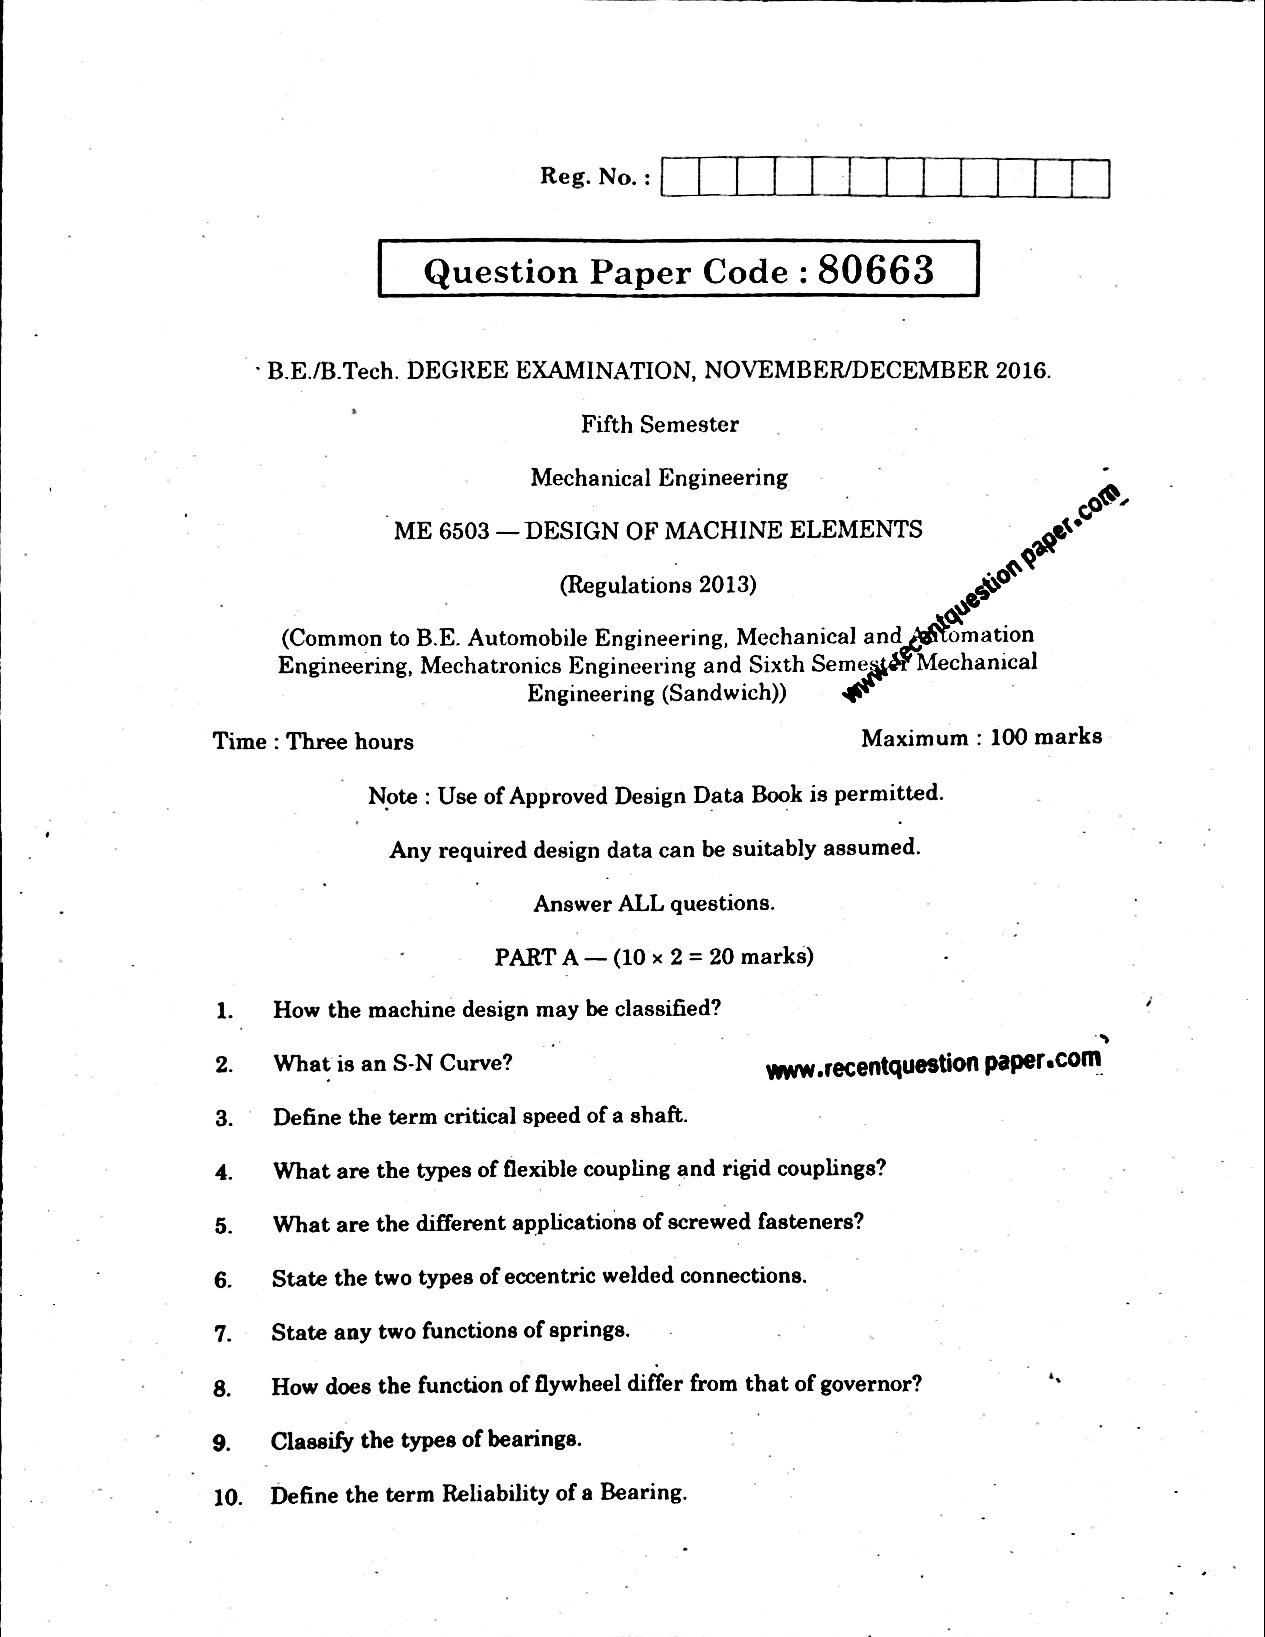 Design Of Machine Elements Anna University Question Nov/Dec 2016